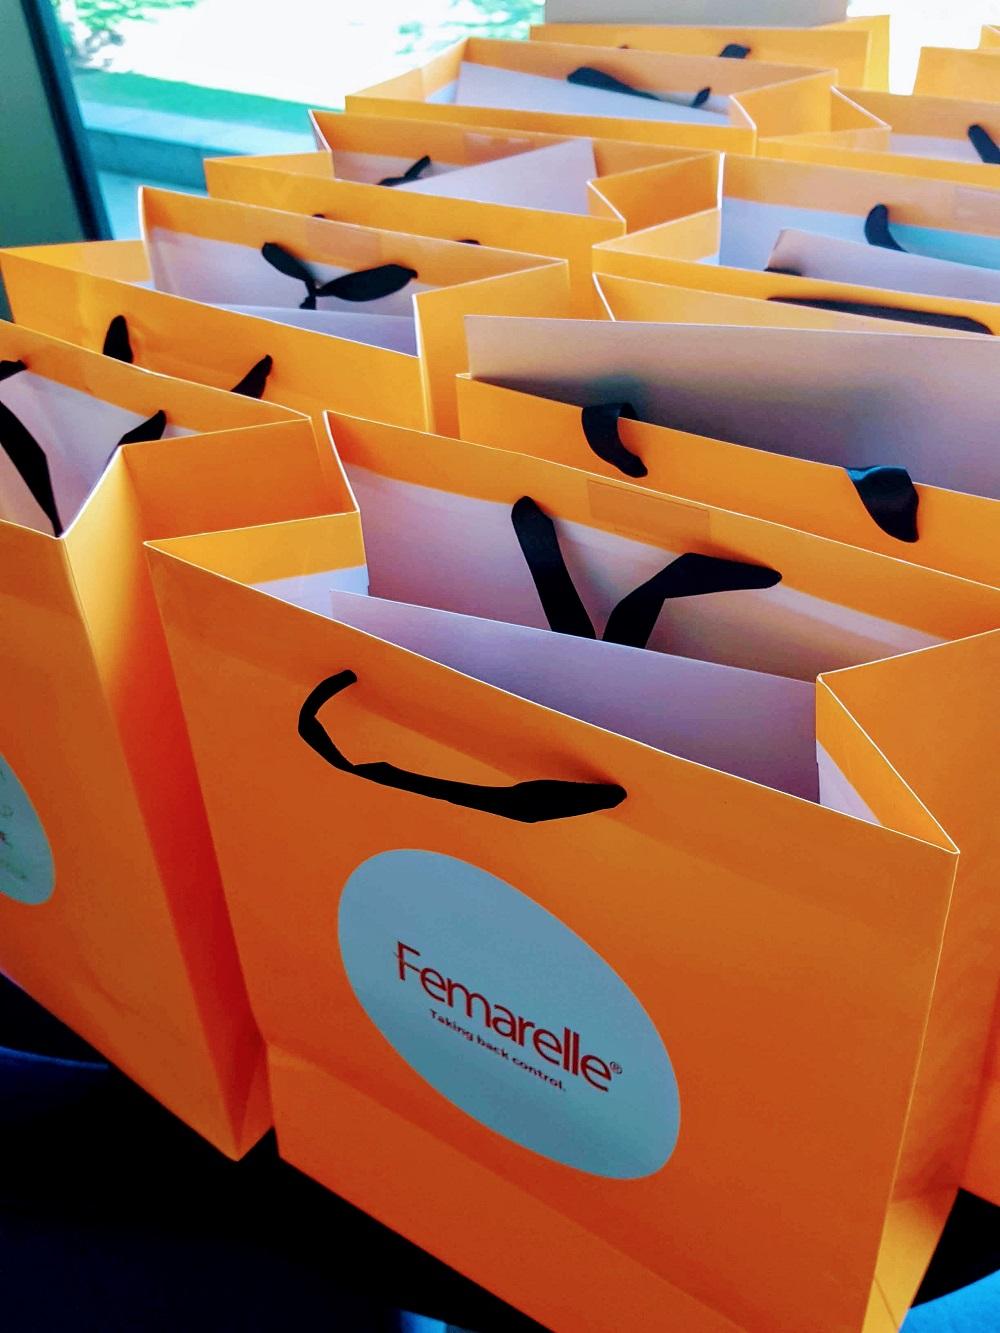 Femarelle® Taking Back Control Campaign.